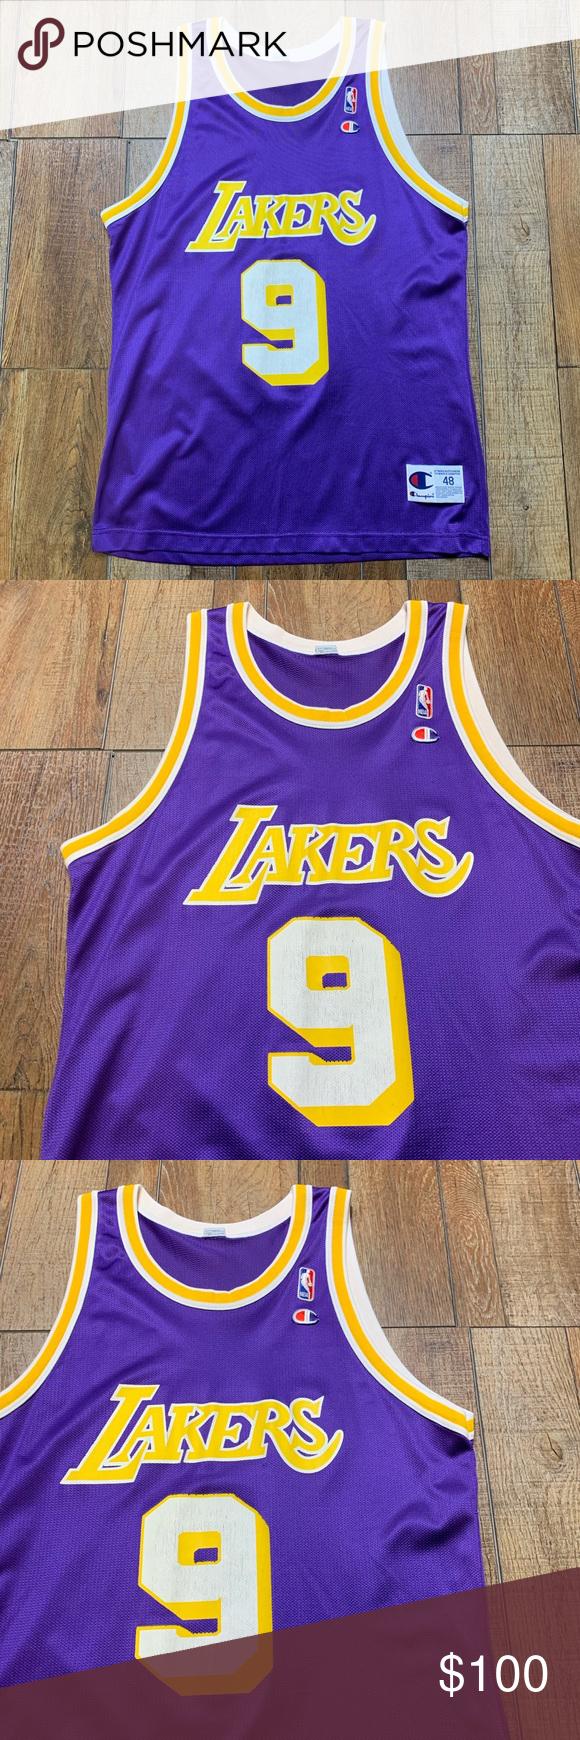 81bba5efa Nick Van Exel LA Lakers Vintage Champion Jersey 48 Excellent Condition Nick  Van Exel  9 Los Angeles Lakers Vintage • Retro • Throwback Authentic    Official ...